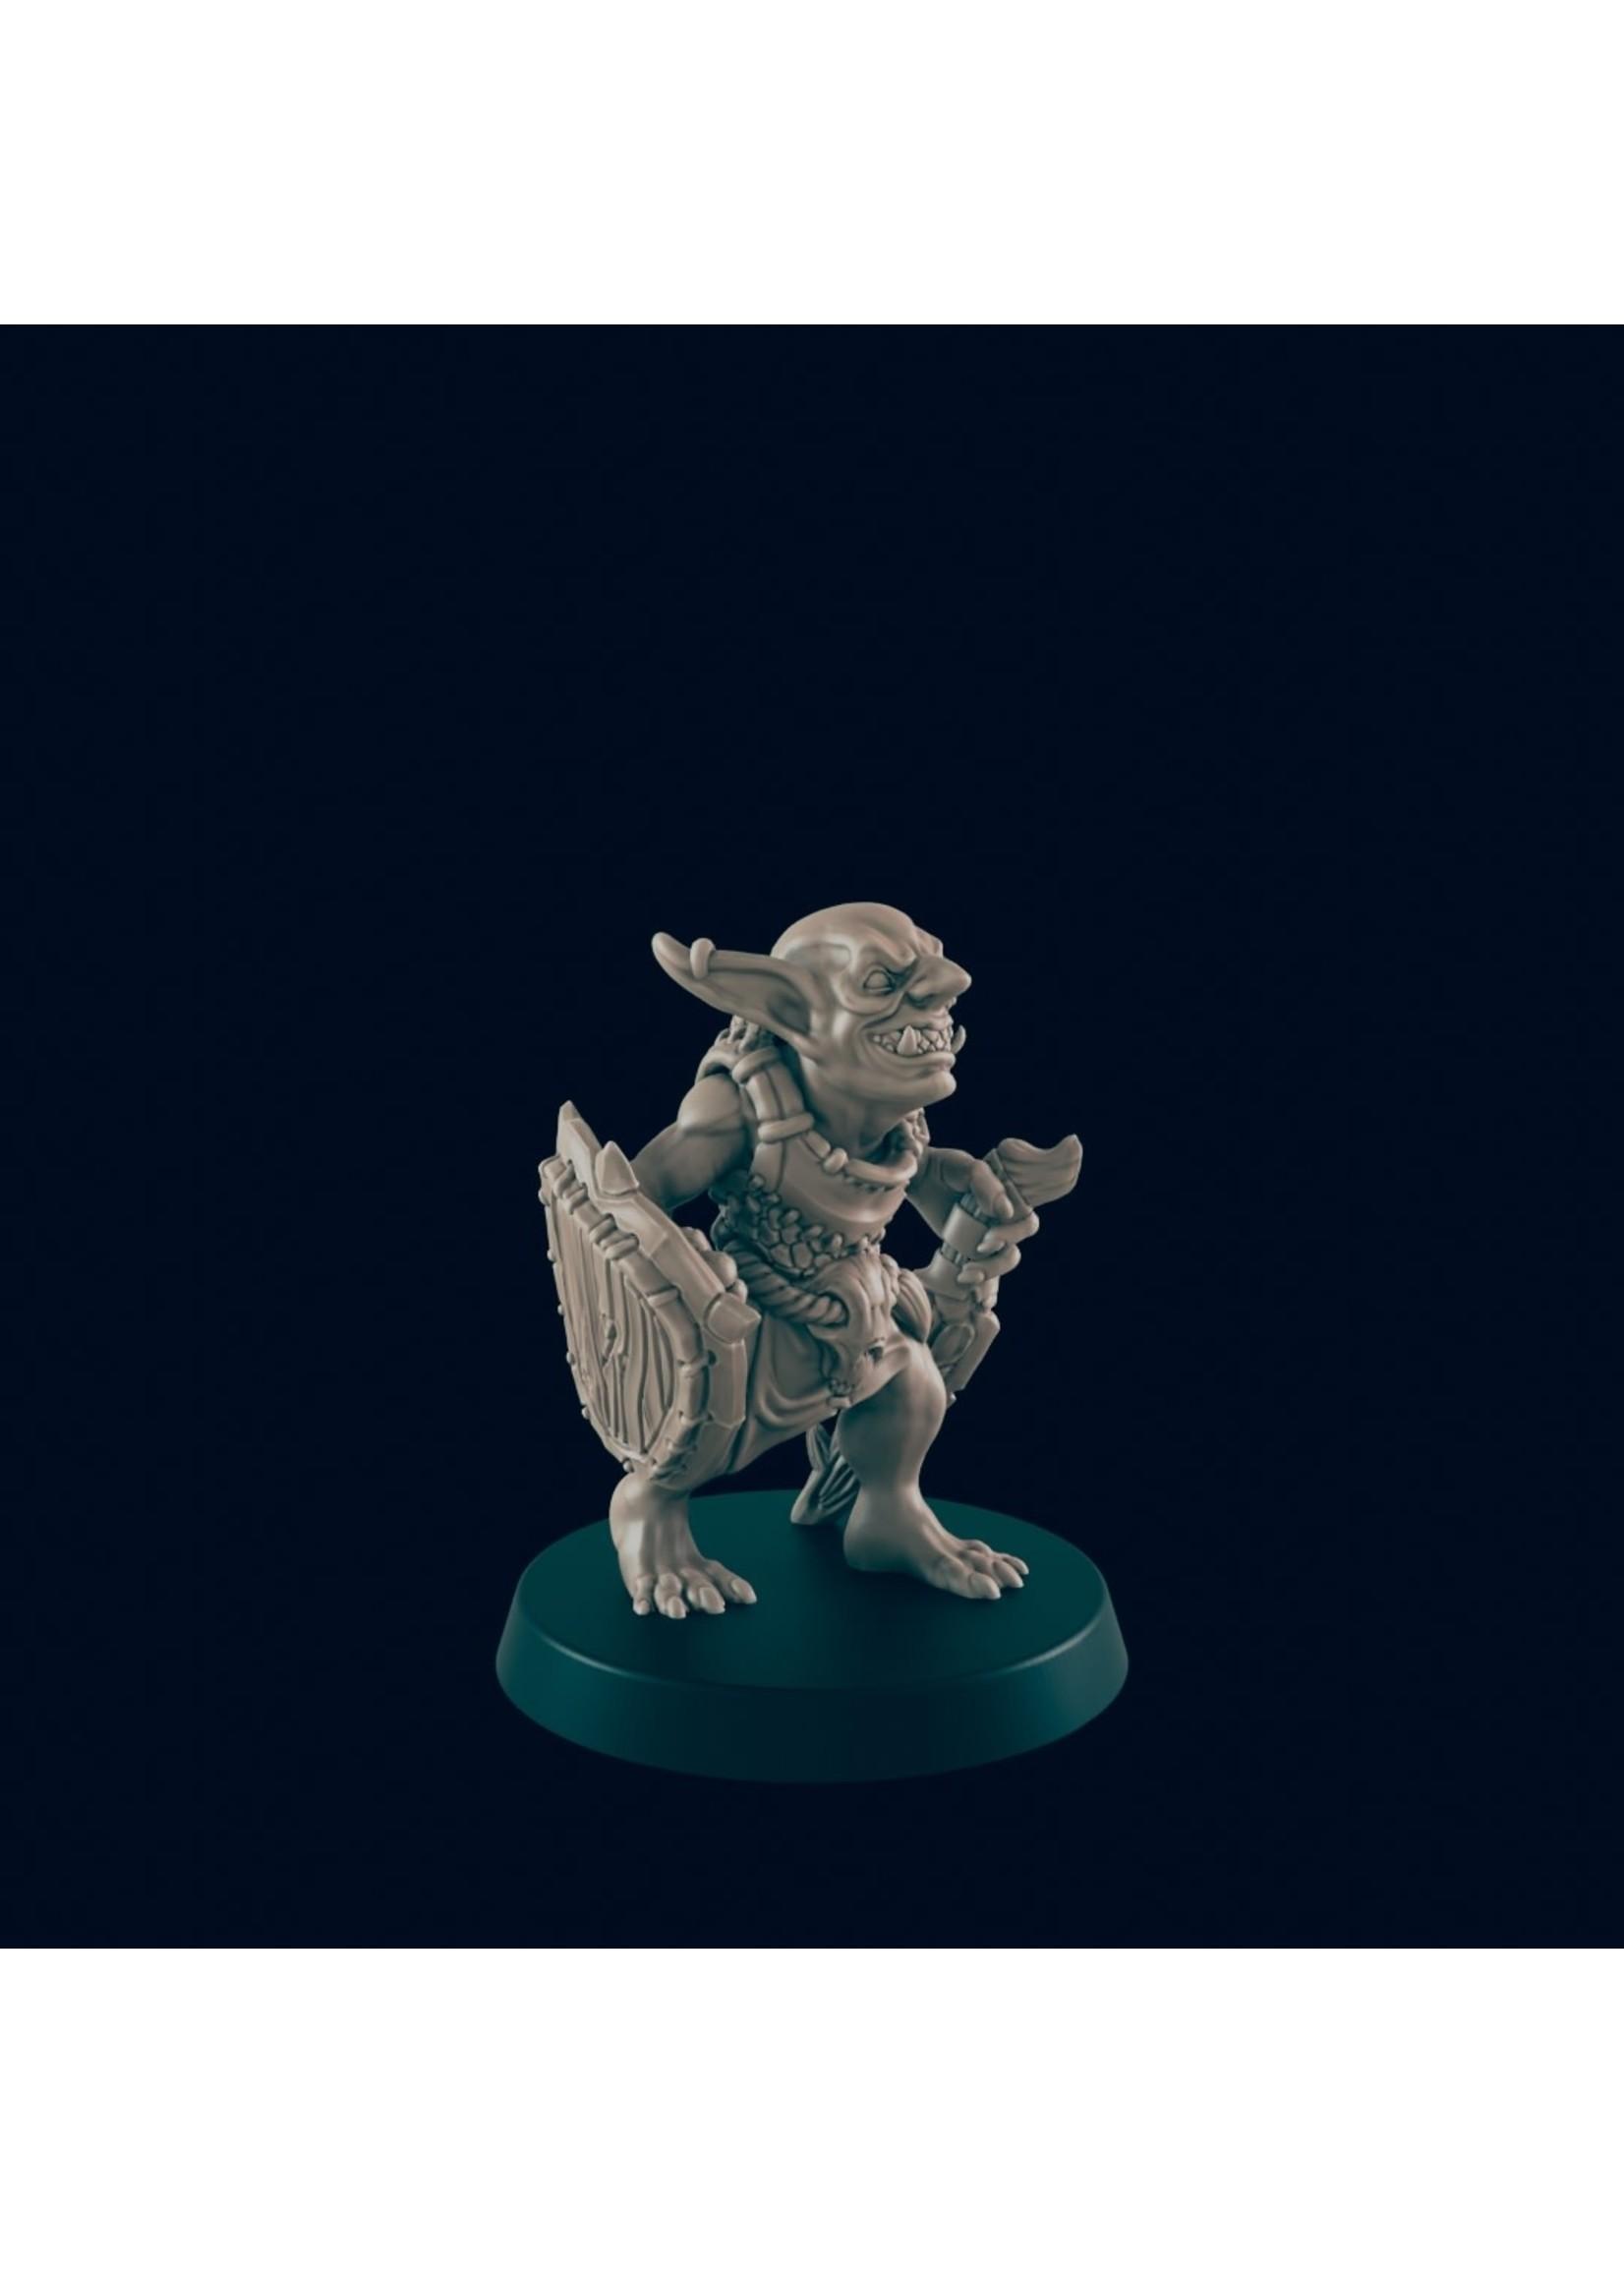 3D Printed Miniature - Goblin Warrior 1 - Dungeons & Dragons - Beasts and Baddies KS